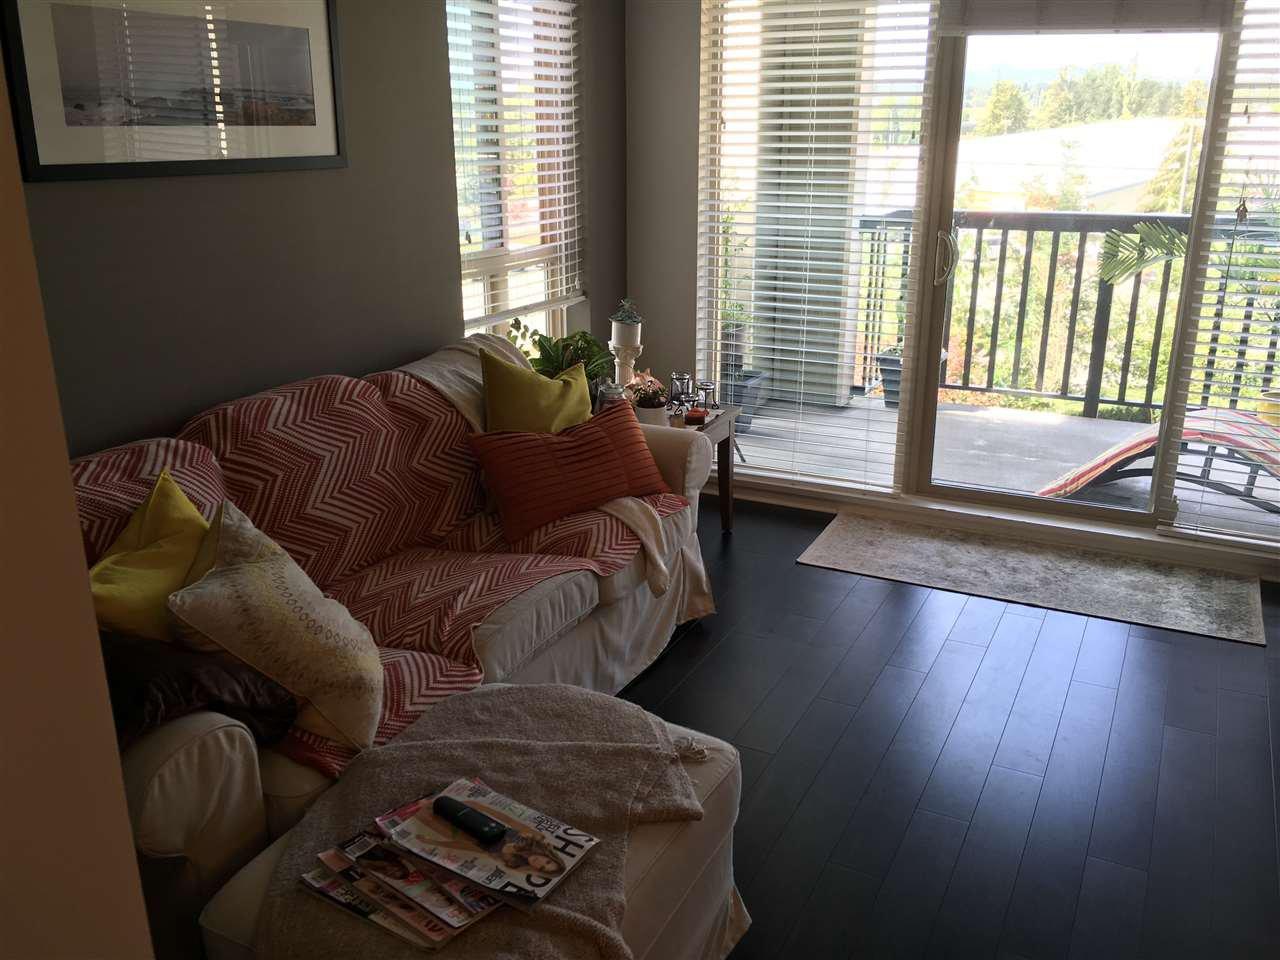 Photo 4: Photos: 309 21009 56 Avenue in Langley: Salmon River Condo for sale : MLS®# R2119471